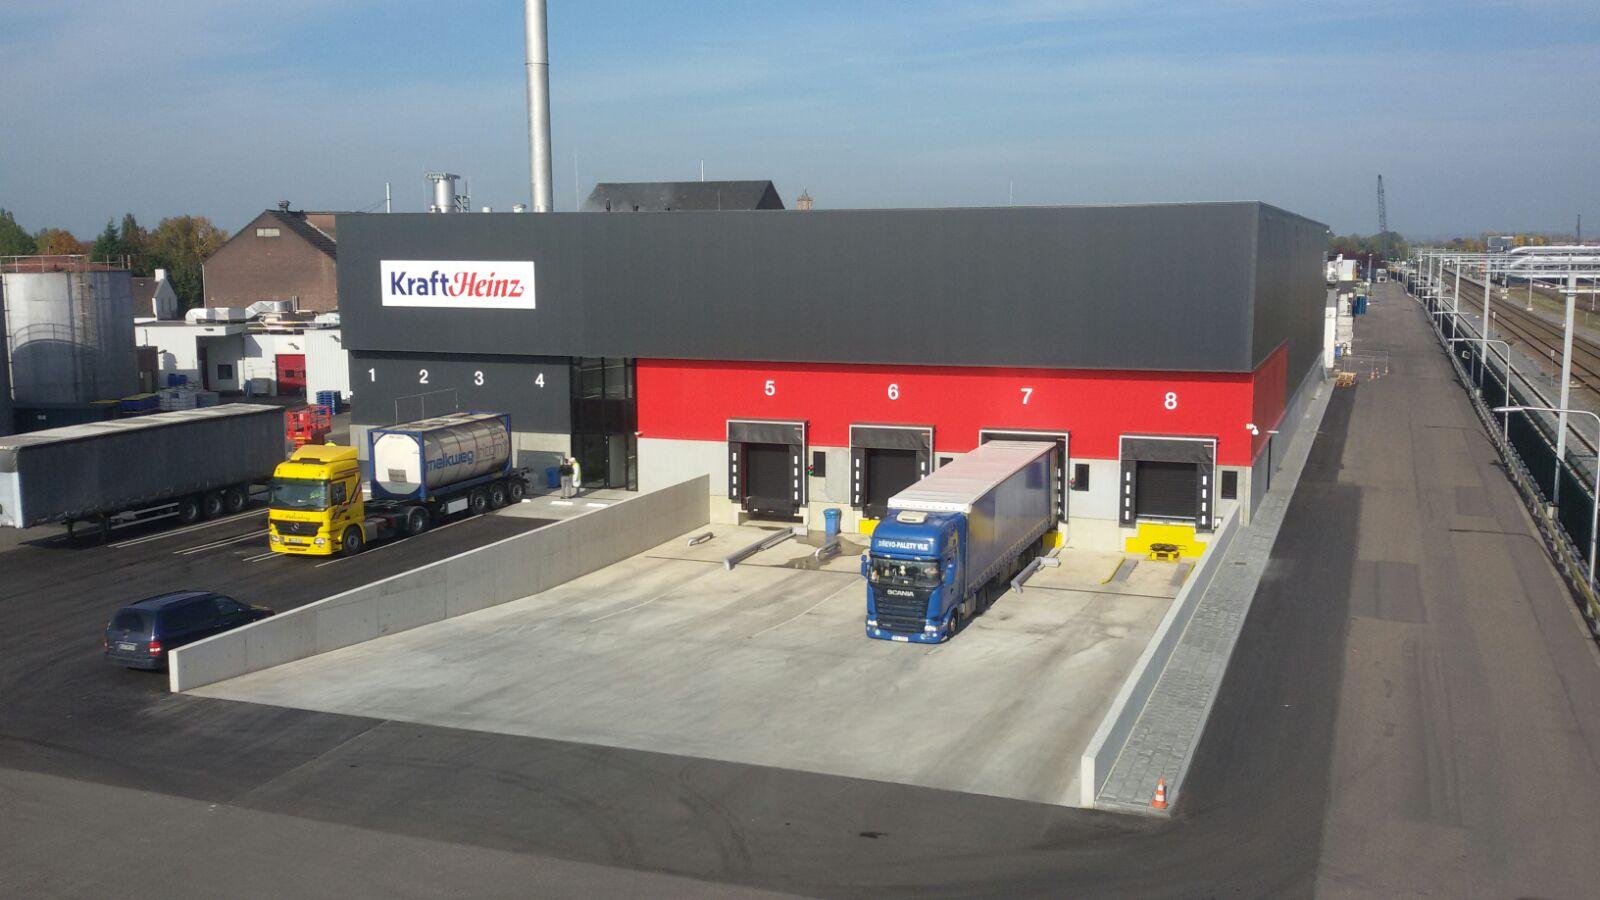 Kraft Heinz plant jobs